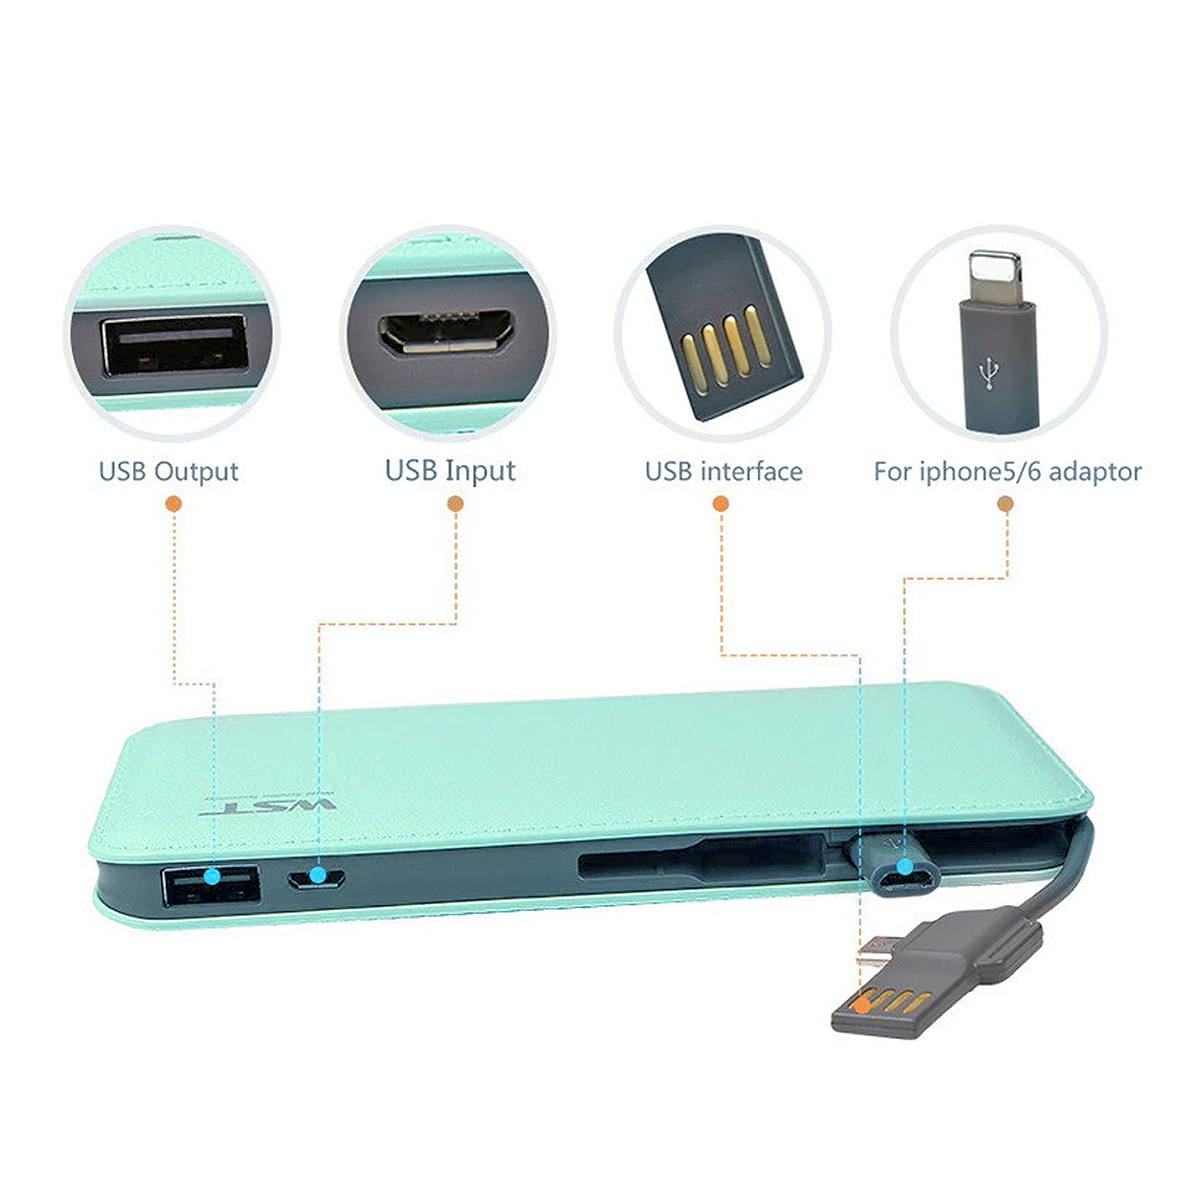 Carregador Portátil 9000mAh com Cabo de Conexão Micro USB V8 Power Bank WST DP622A Turquesa